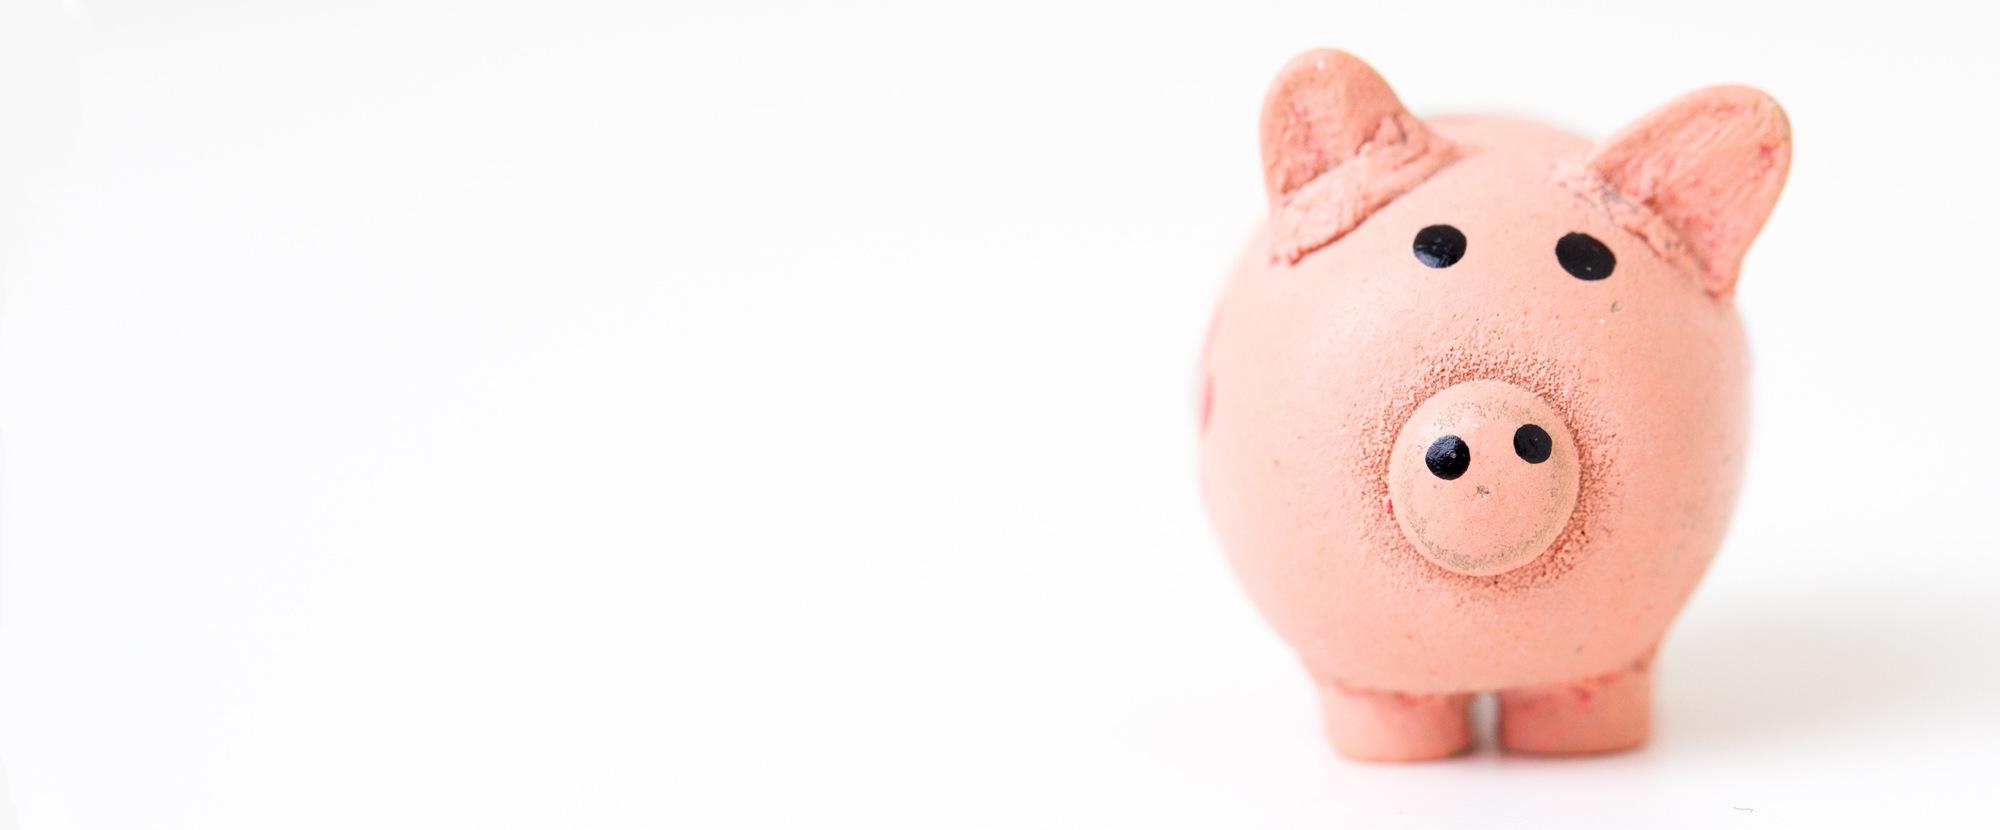 creer sa marque de vetement budget cout infographie